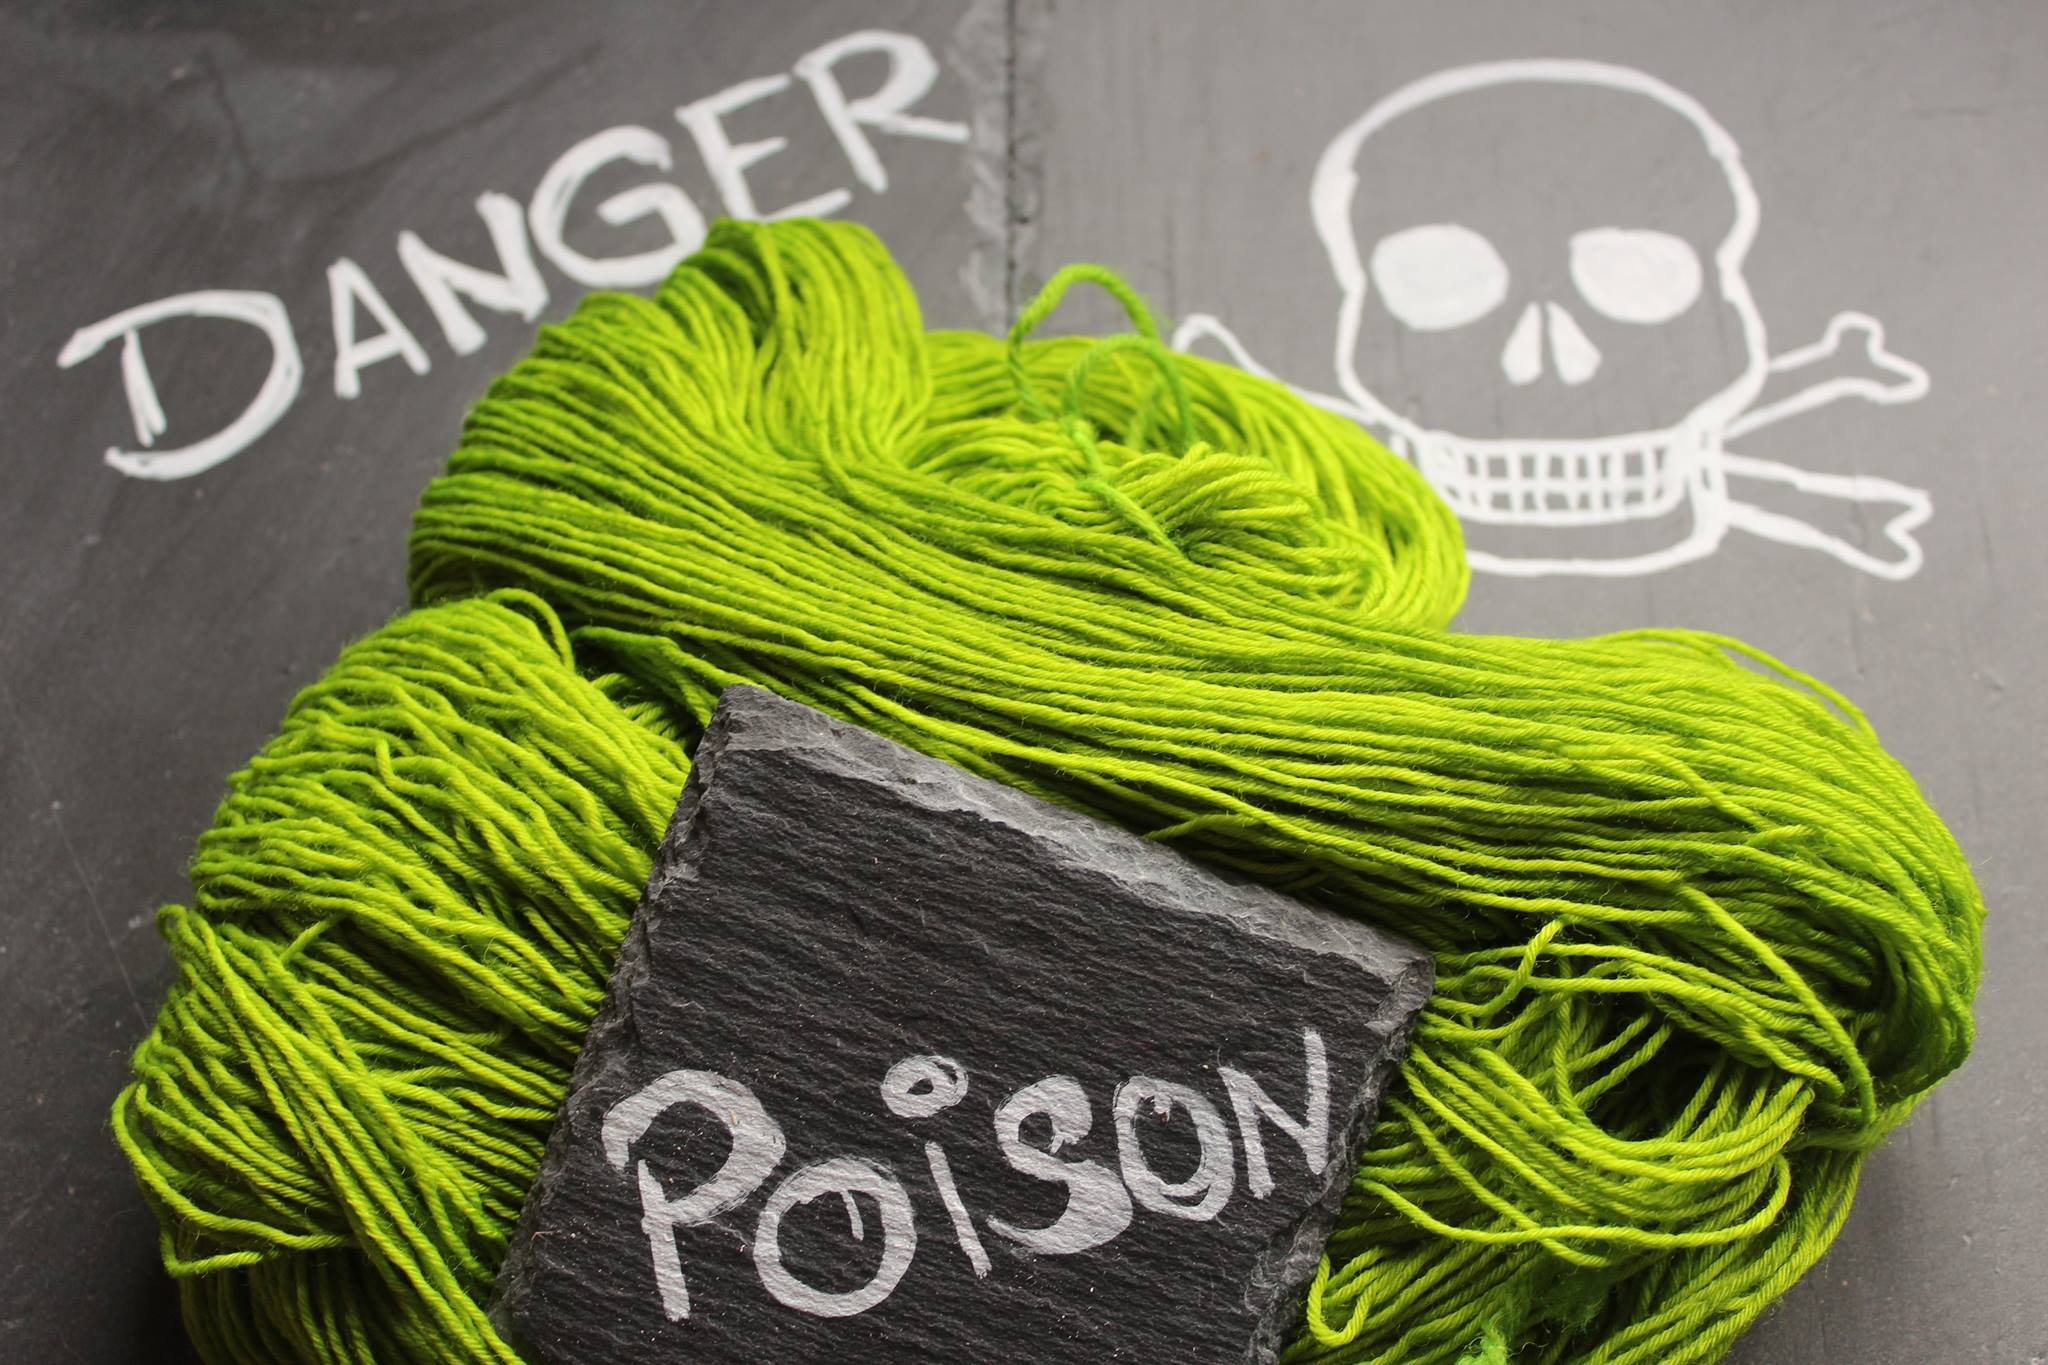 Poison Pure Merino